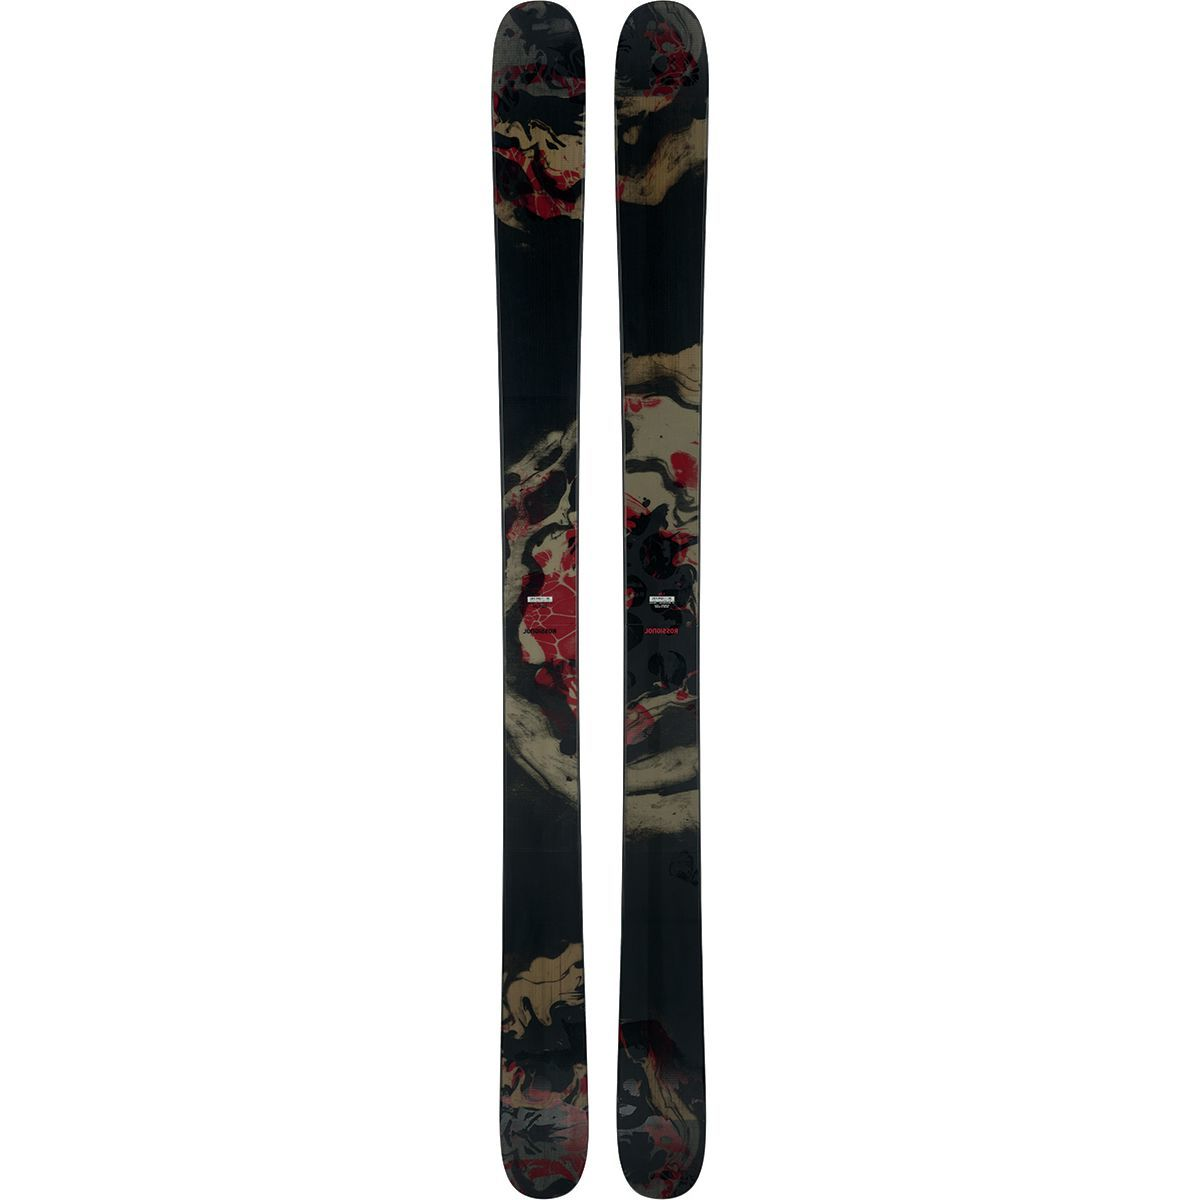 Rossignol Black Ops 118 Ski - Men's